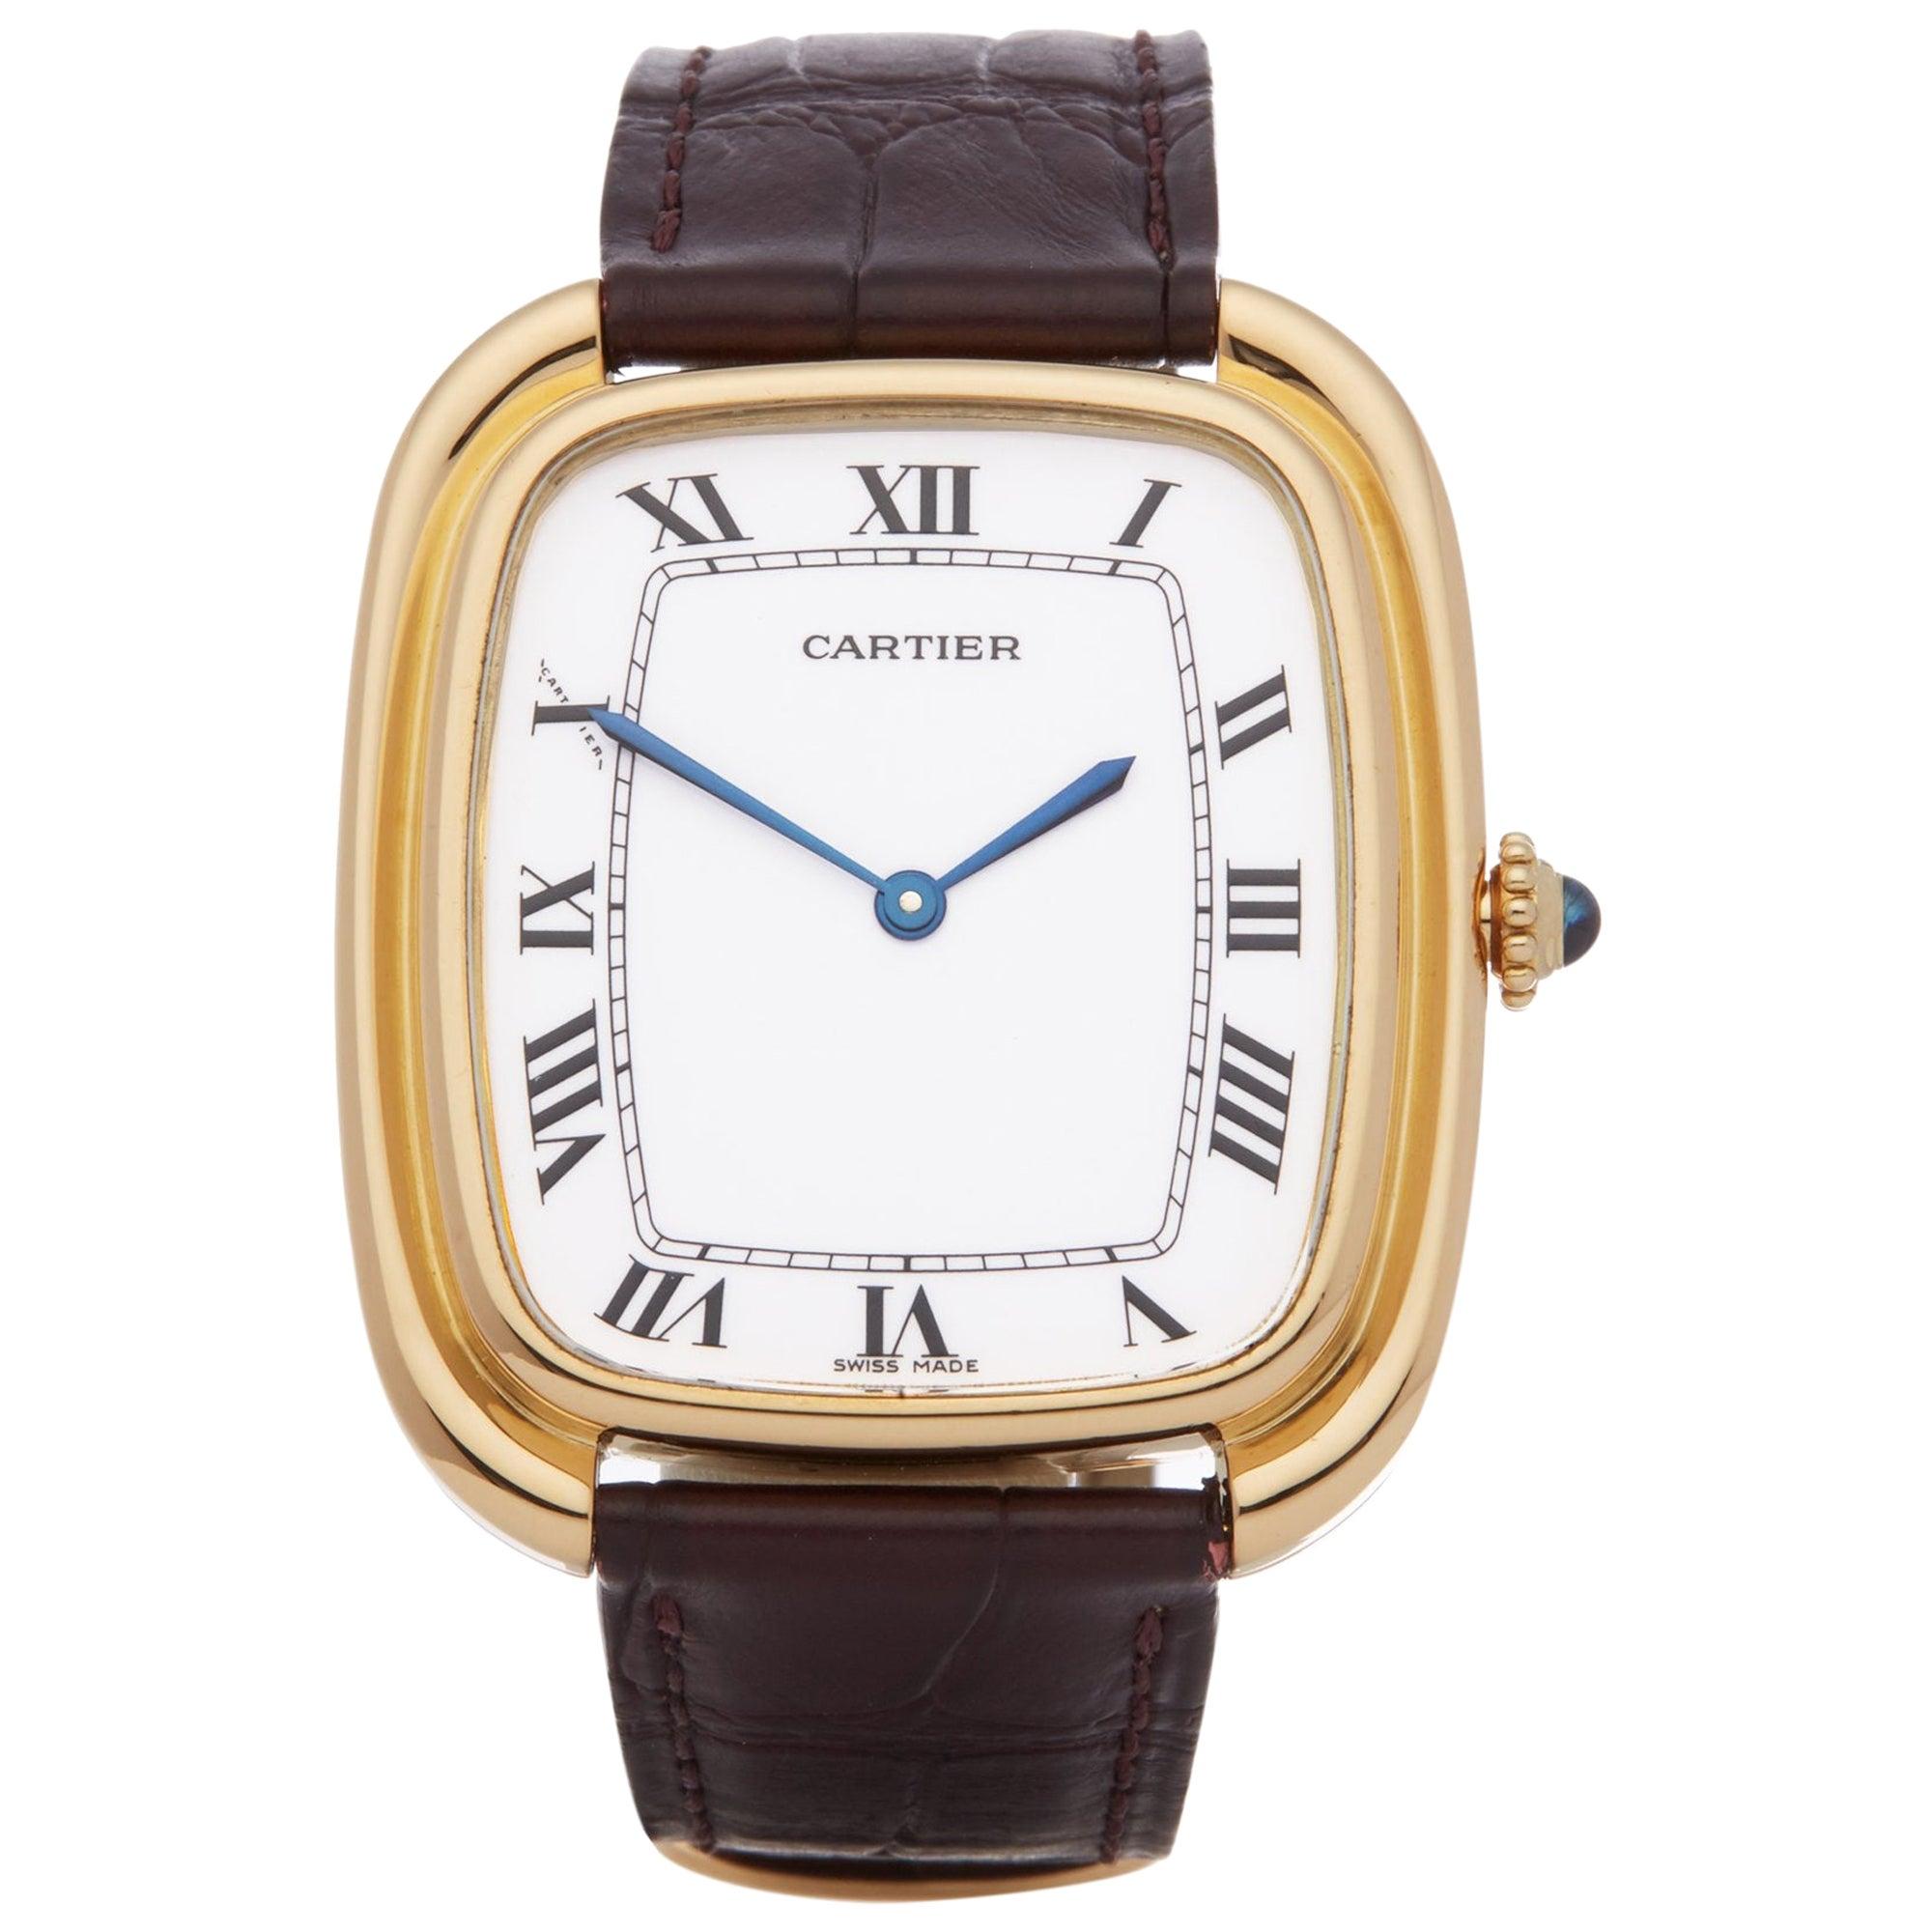 Cartier Gondole Jumbo Paris 81720400 Men's Yellow Gold Watch